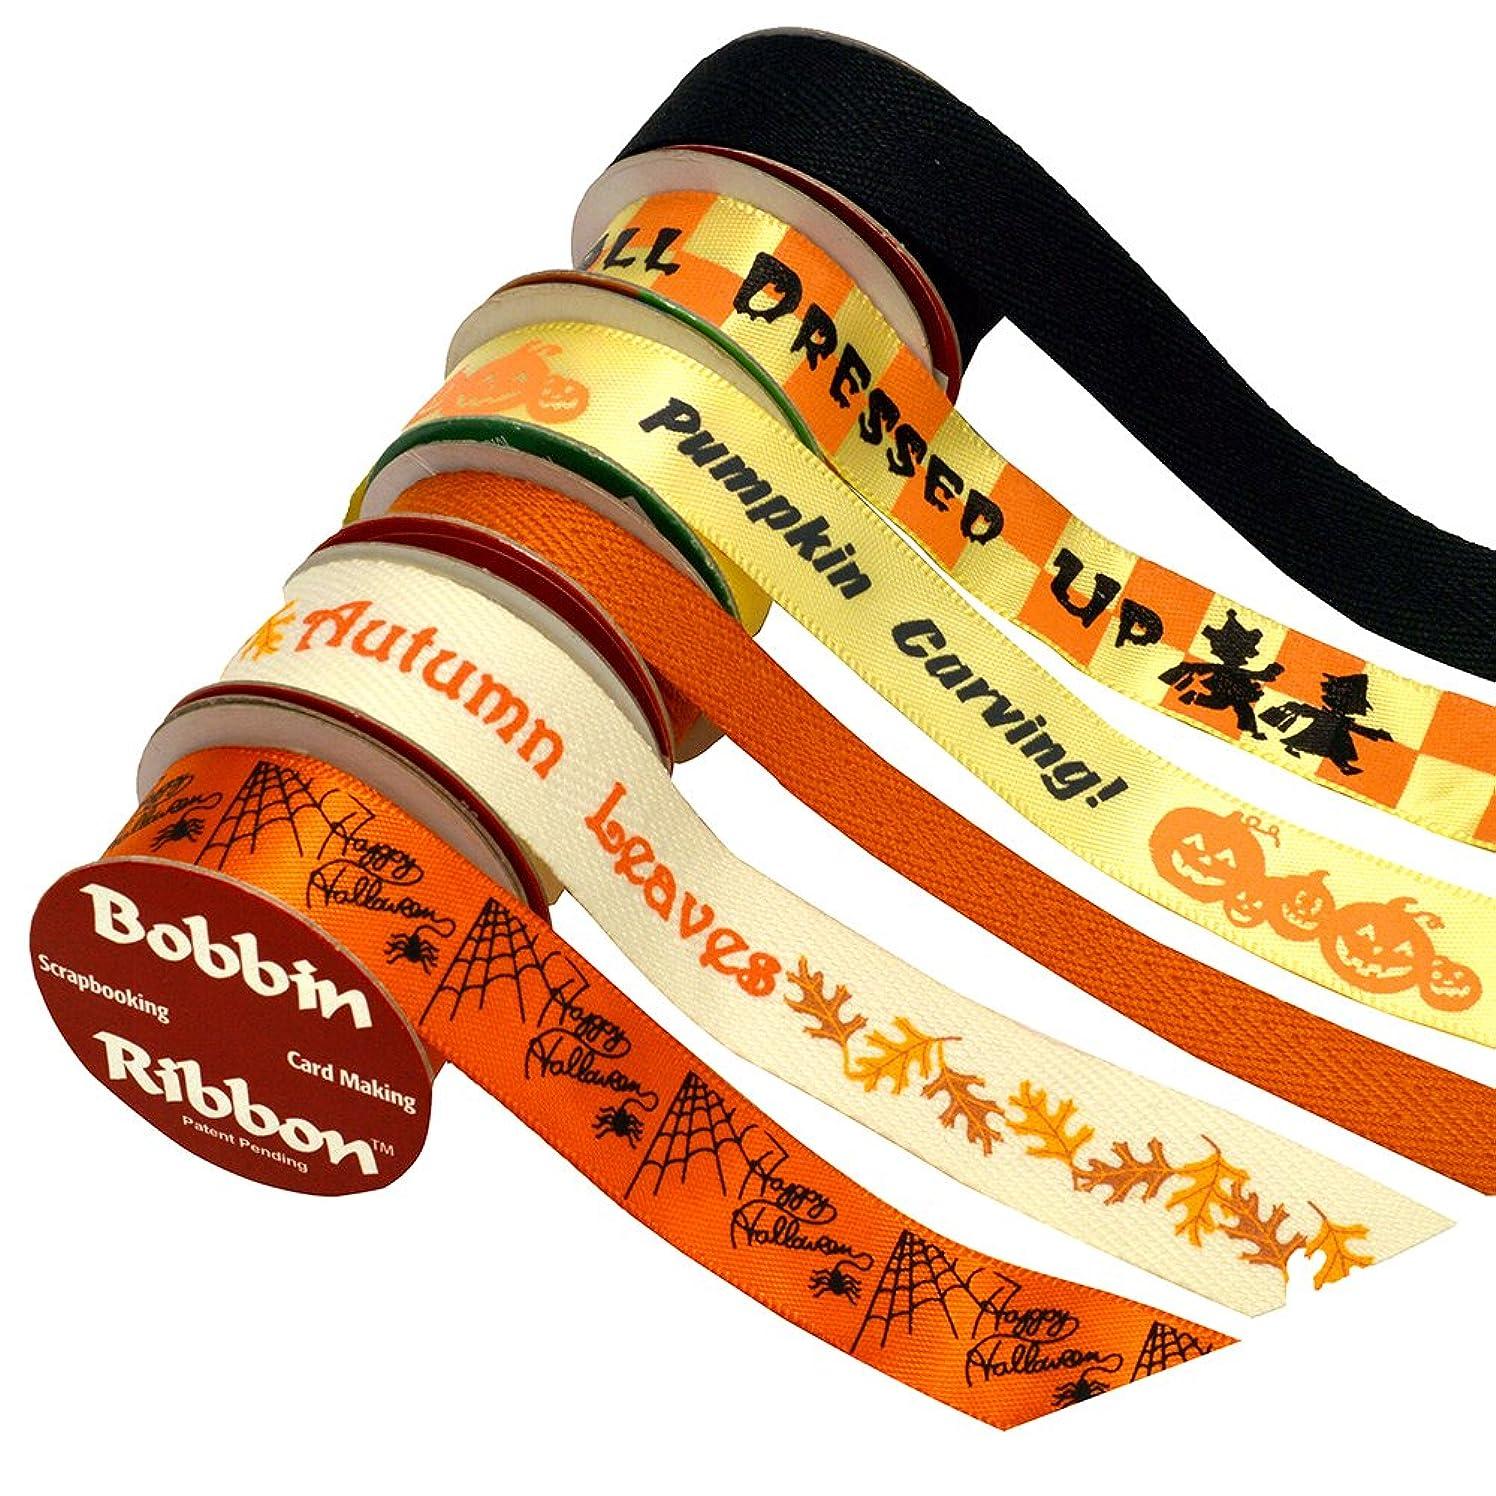 Morex Bobbin Ribbon for Scrapbooking, Halloween, 6-Pack